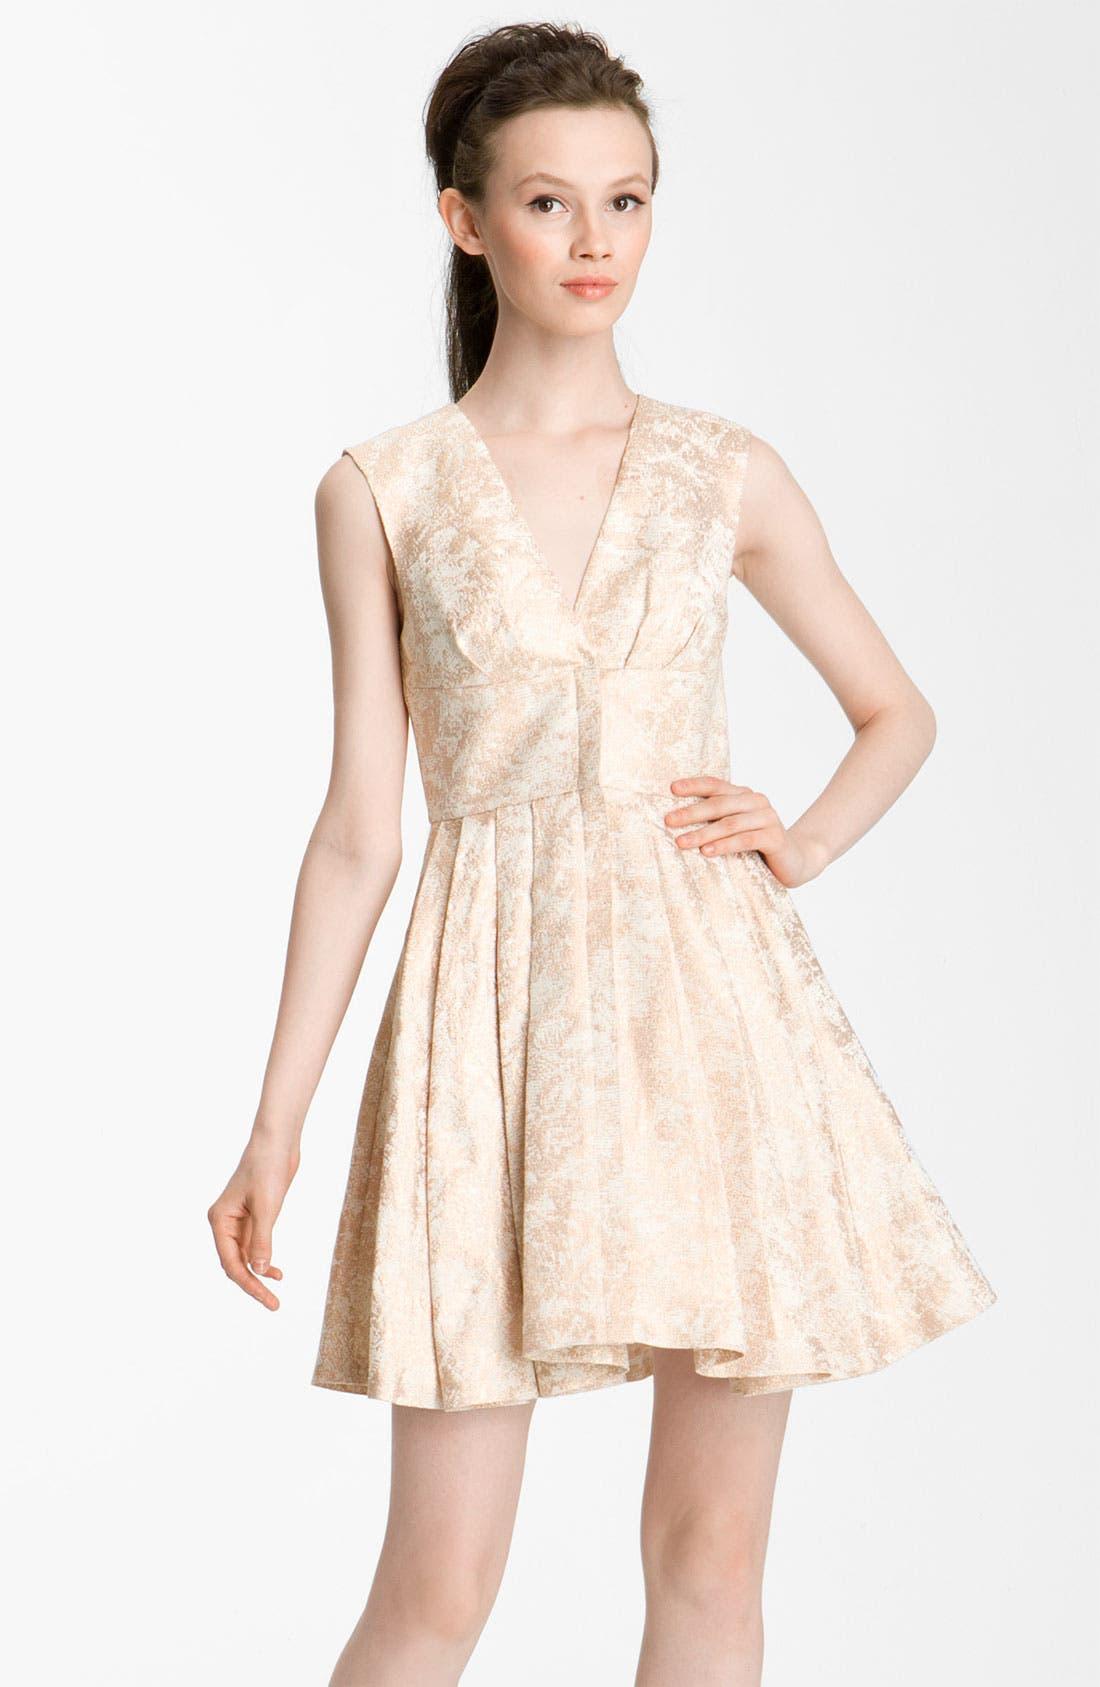 Main Image - Rachel Zoe 'Daria' Metallic Brocade Dress